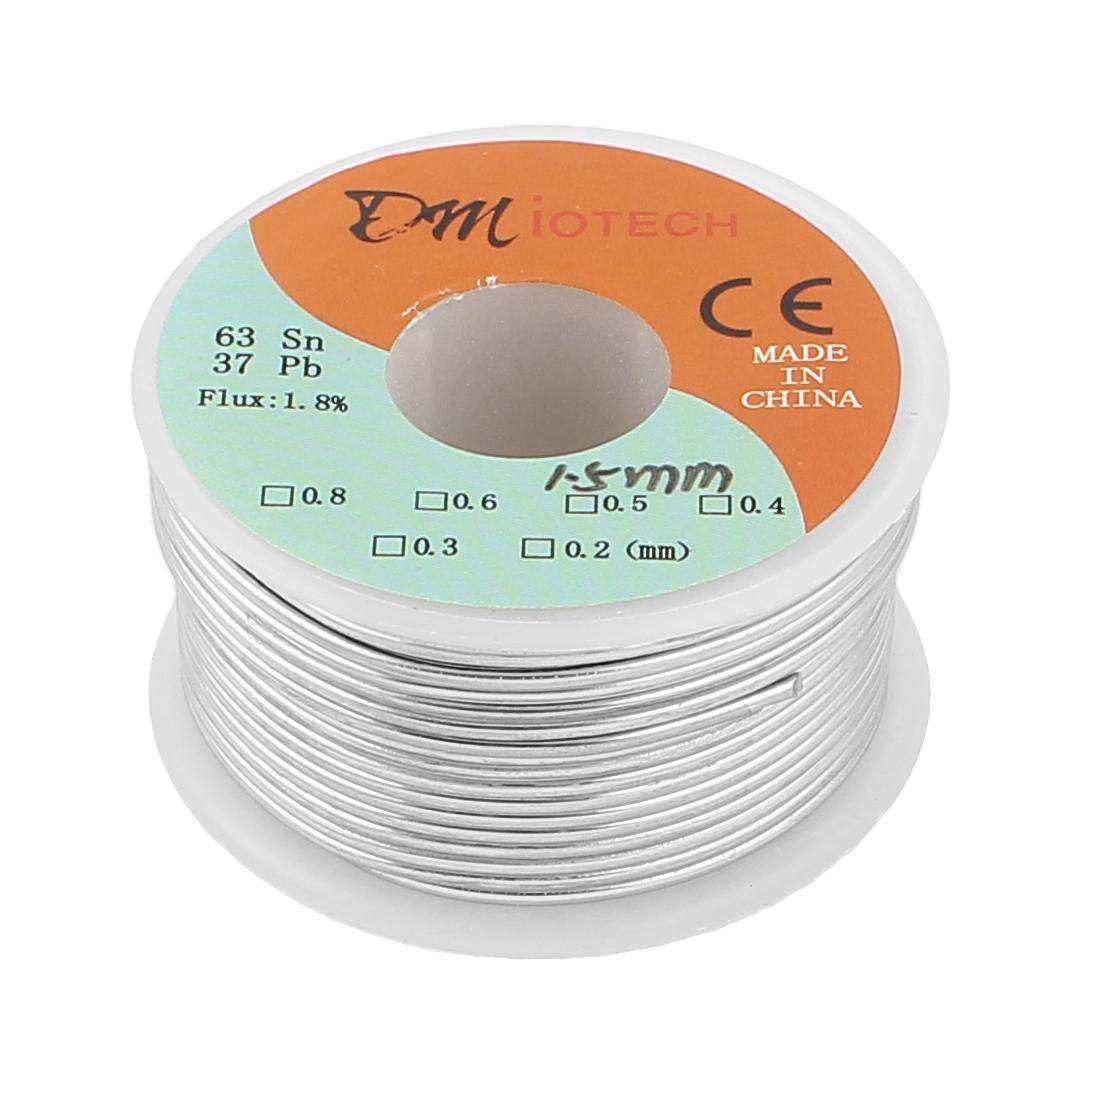 DMiotech 1.5mm 150g 63/37 Tin Lead Roll Rosin Cored Soldering Wire Reel